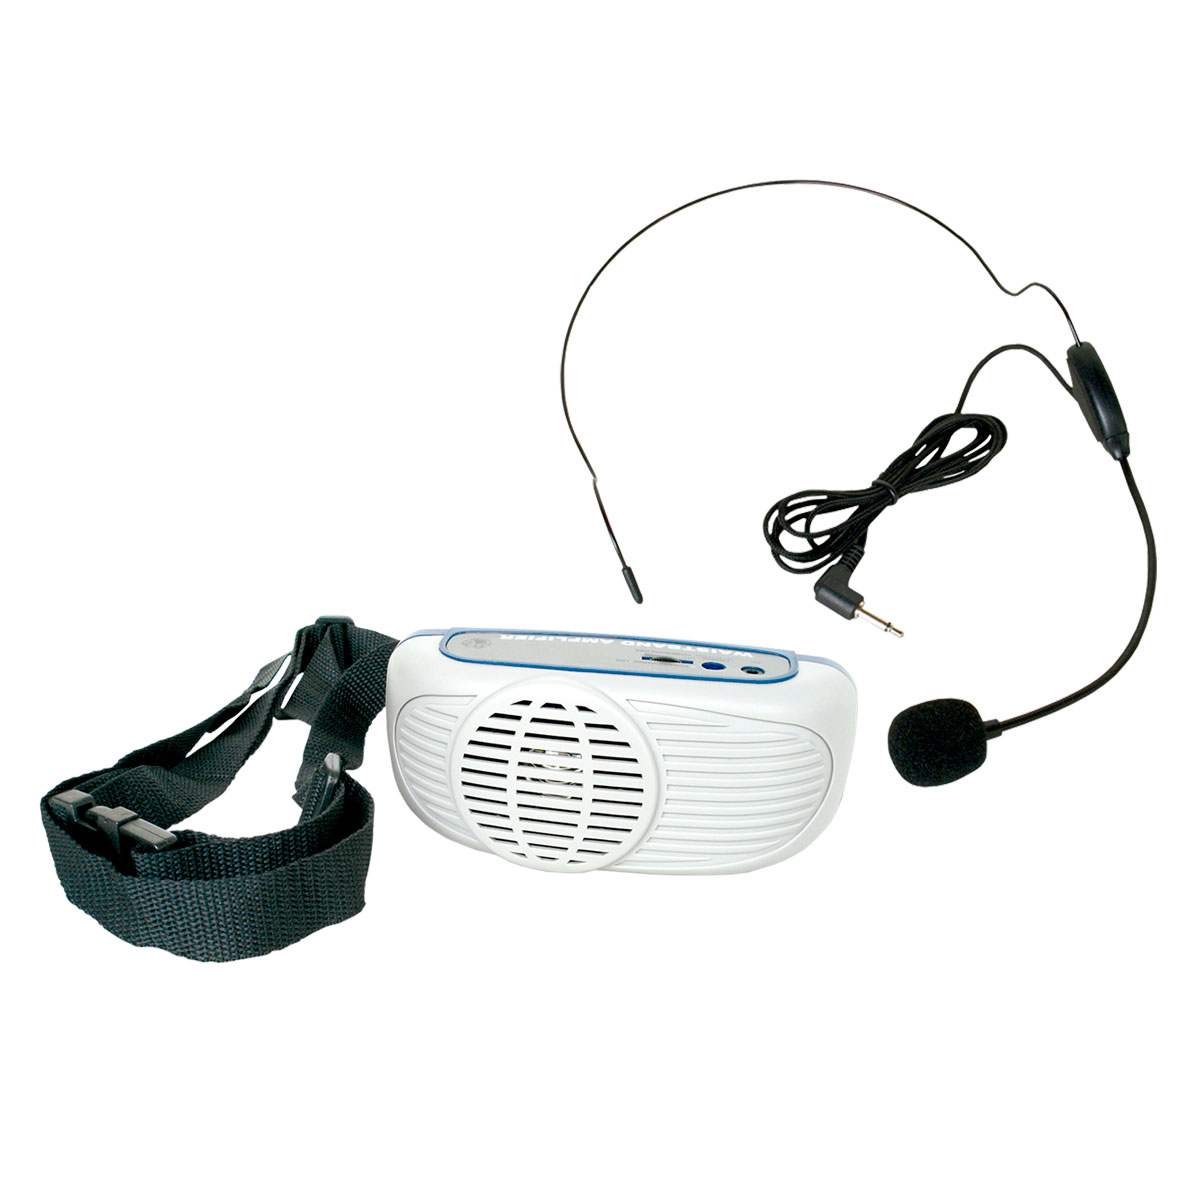 BW500X - Kit Professor Portátil c/ Caixa + Microfone c/ Fio BW 500 X - CSR